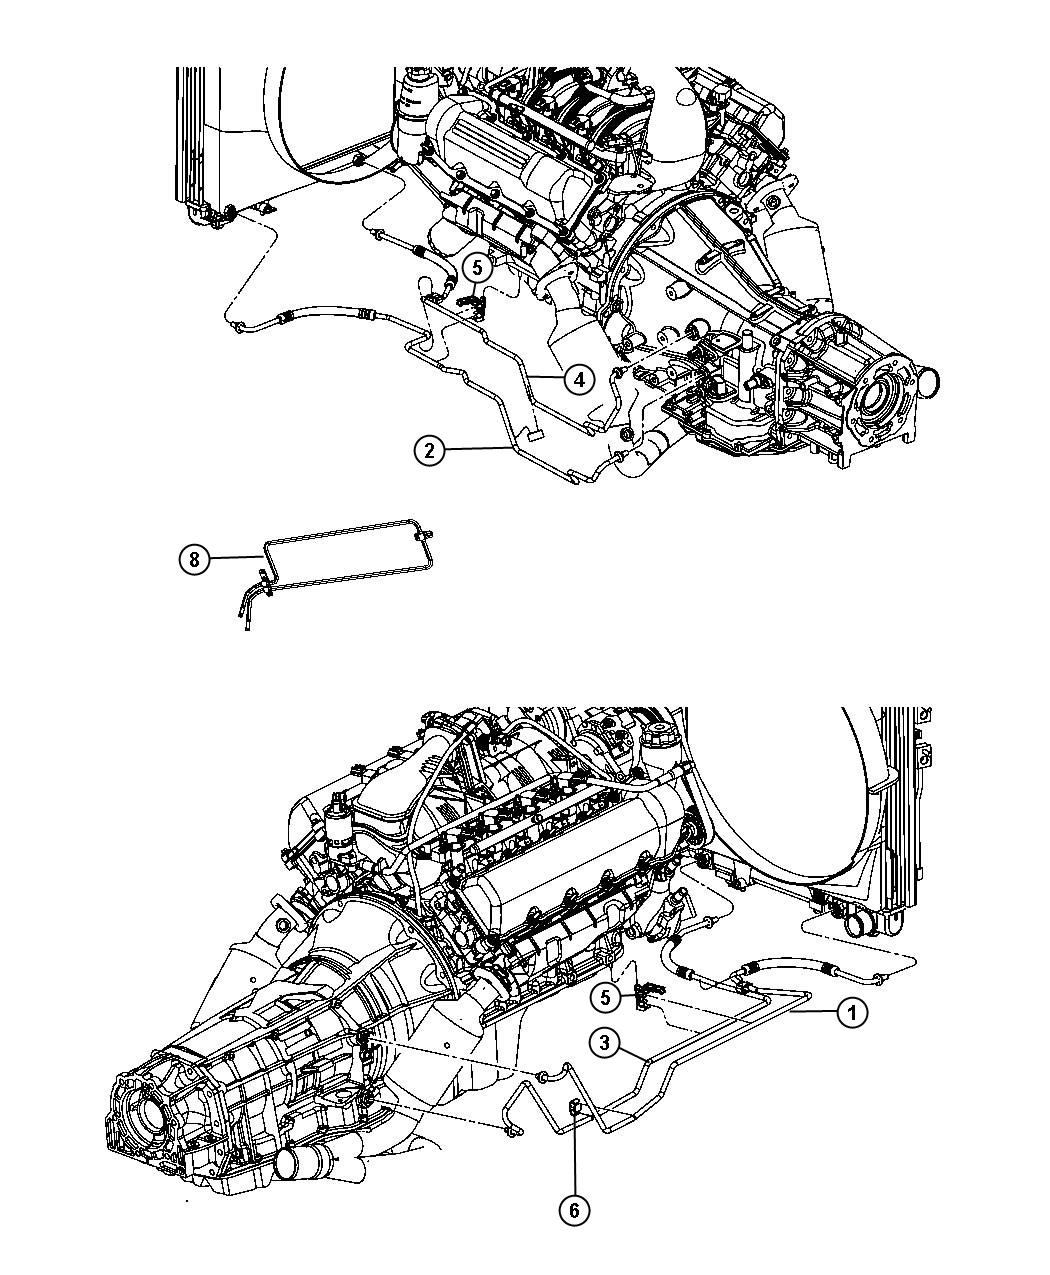 2008 Dodge Dakota SXT EXTENDED CAB 6.5 FT BOX 3.7L Magnum